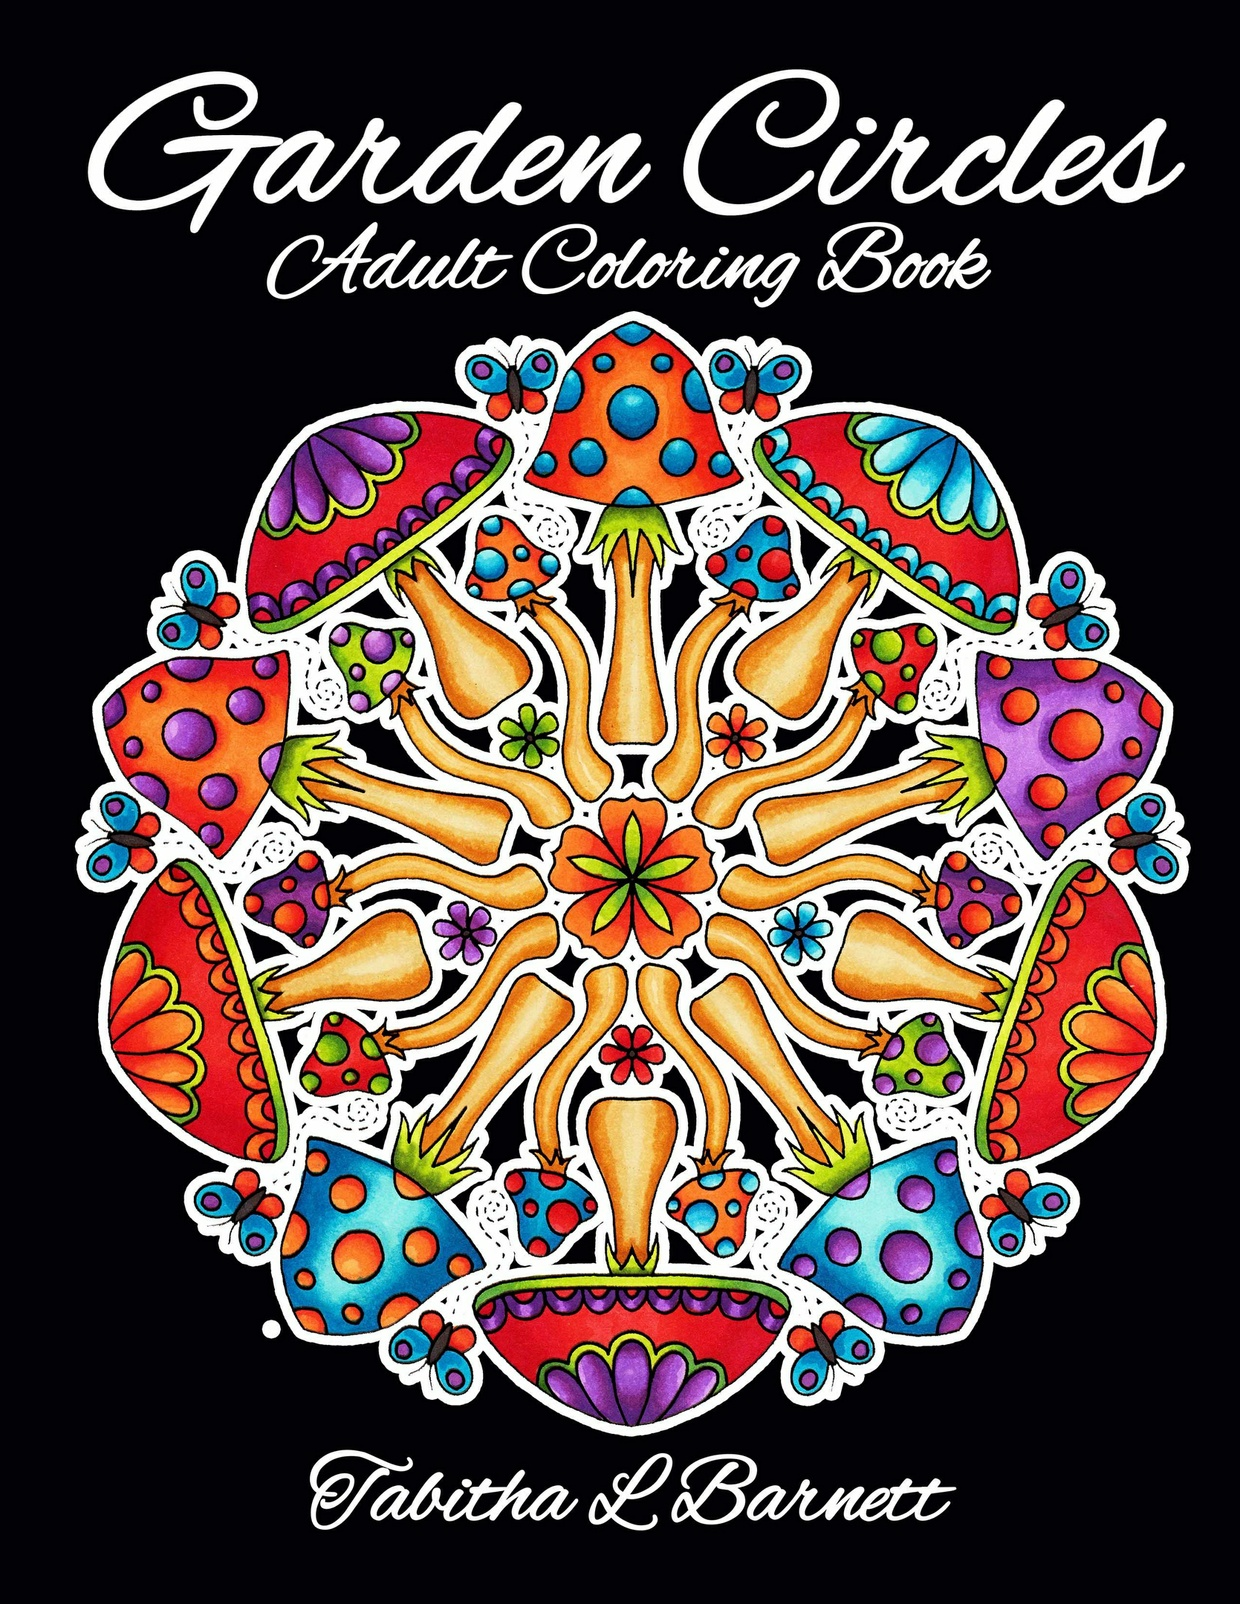 Garden Circles Adult Coloring Book PDF